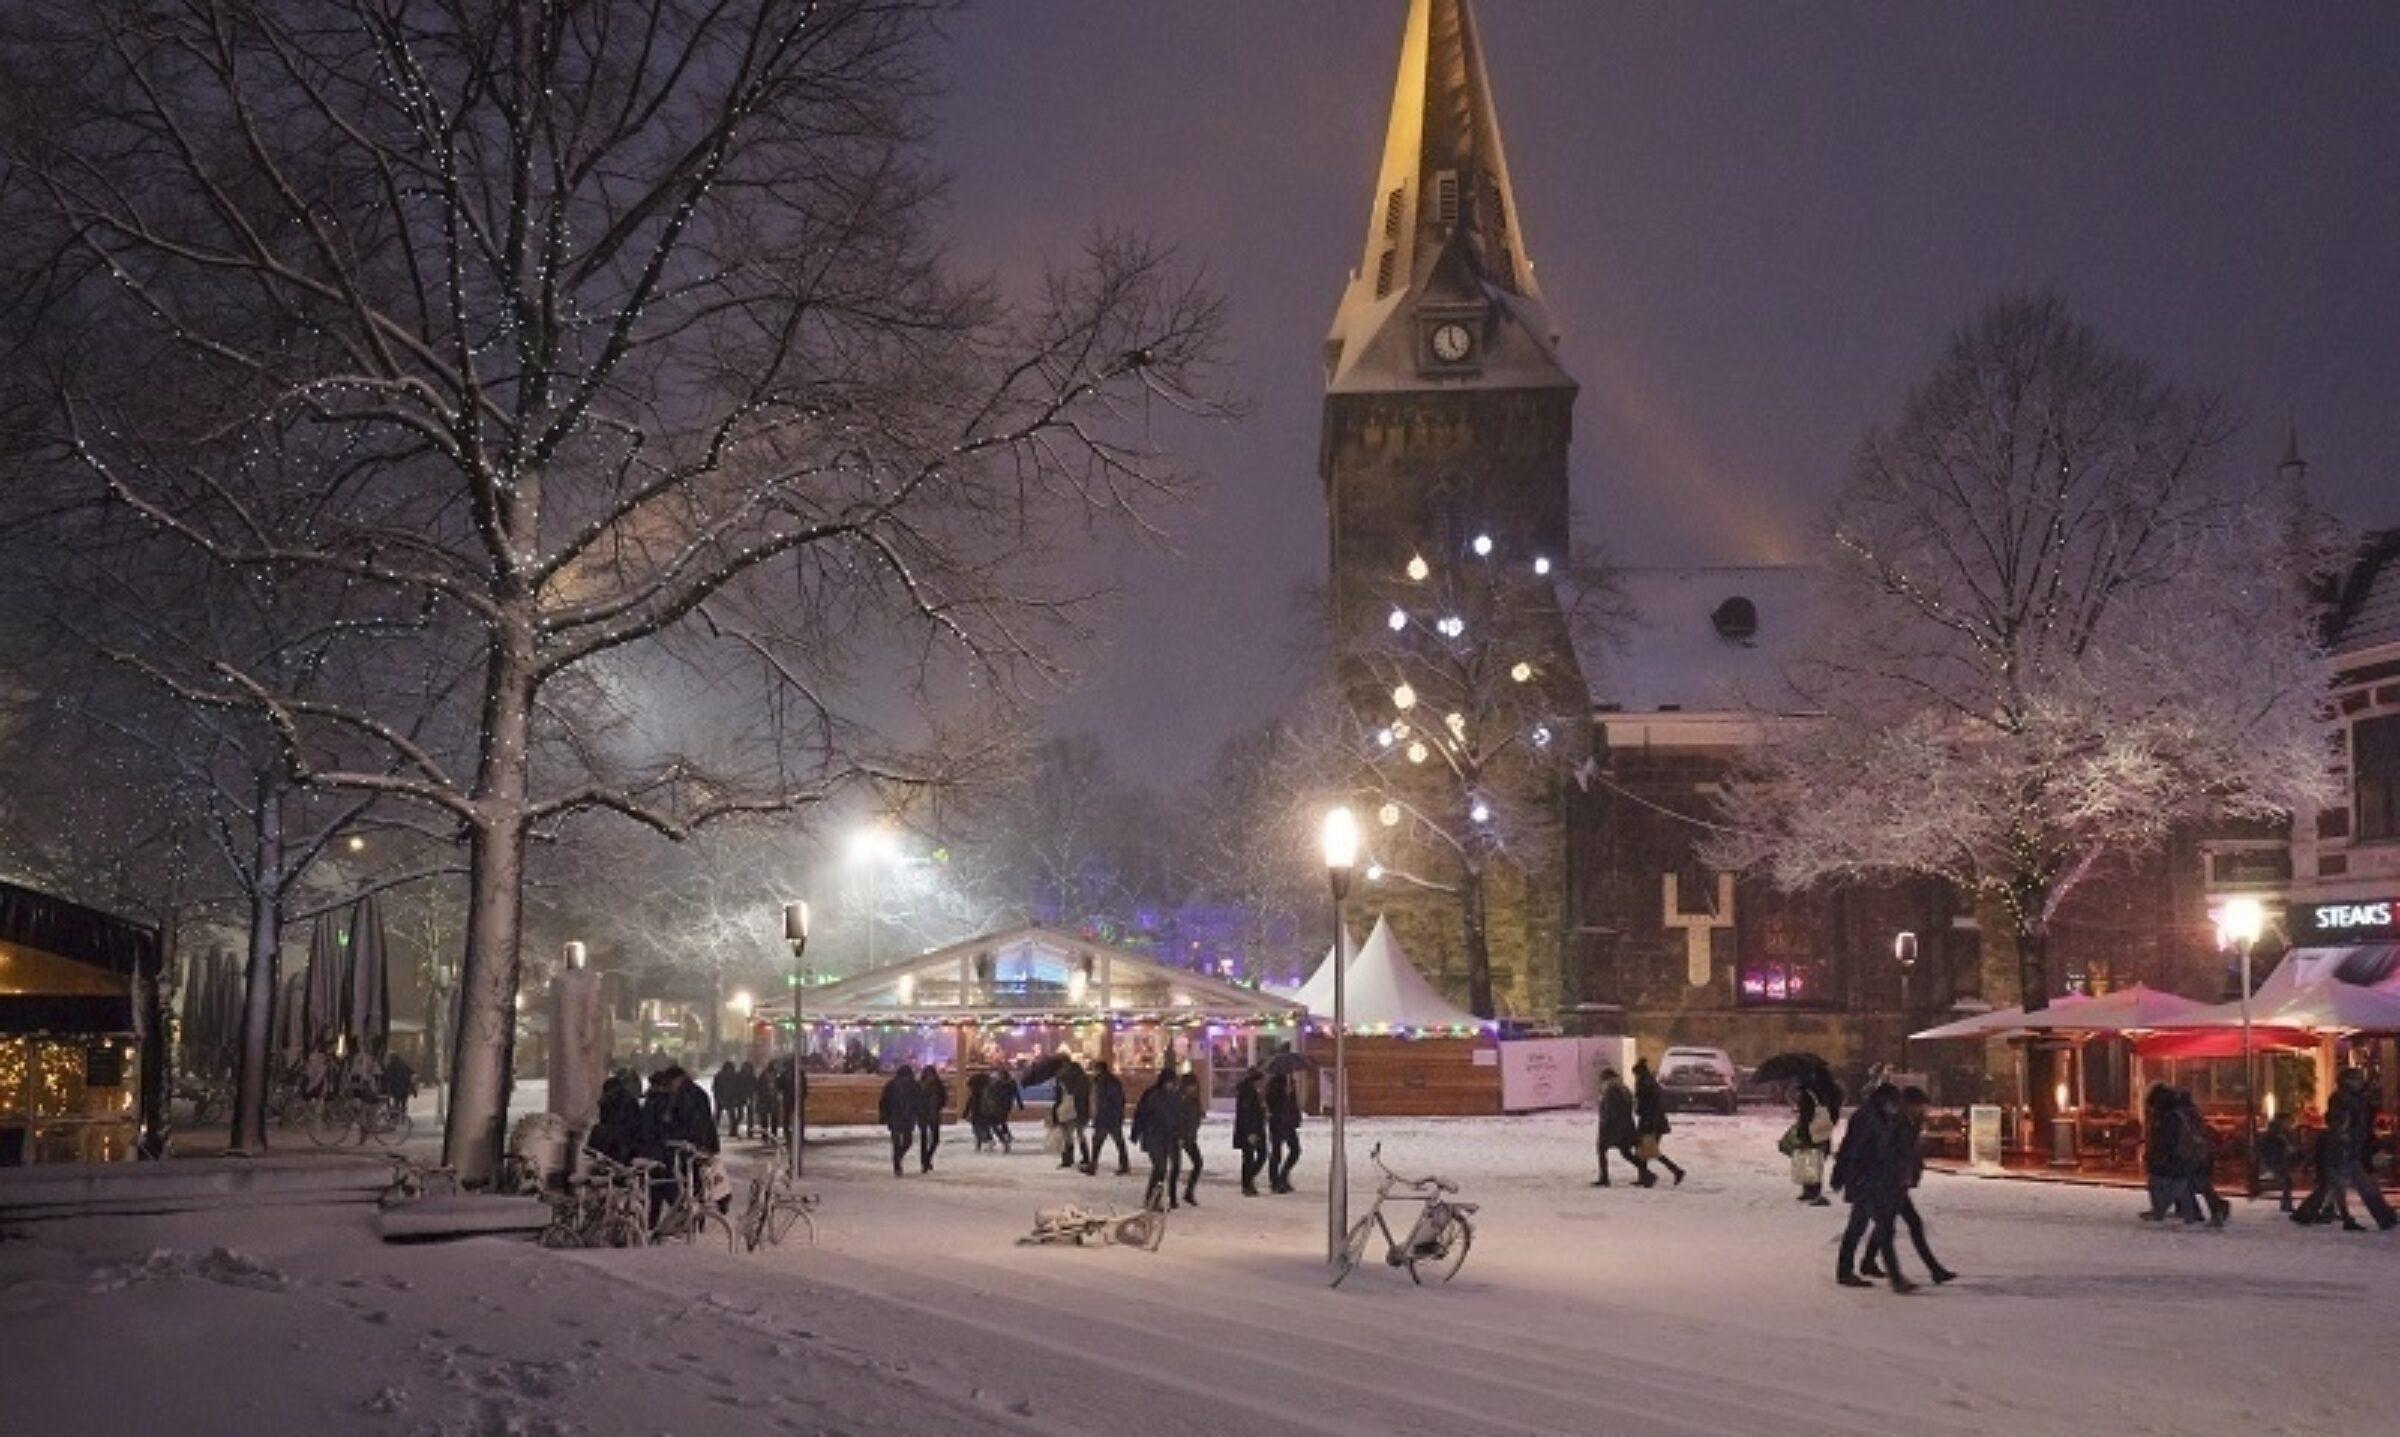 2017 Ebo Fraterman Oude Markt Winter Wonderland evenementen klein 3375 1565701080 35hxmn2ci2